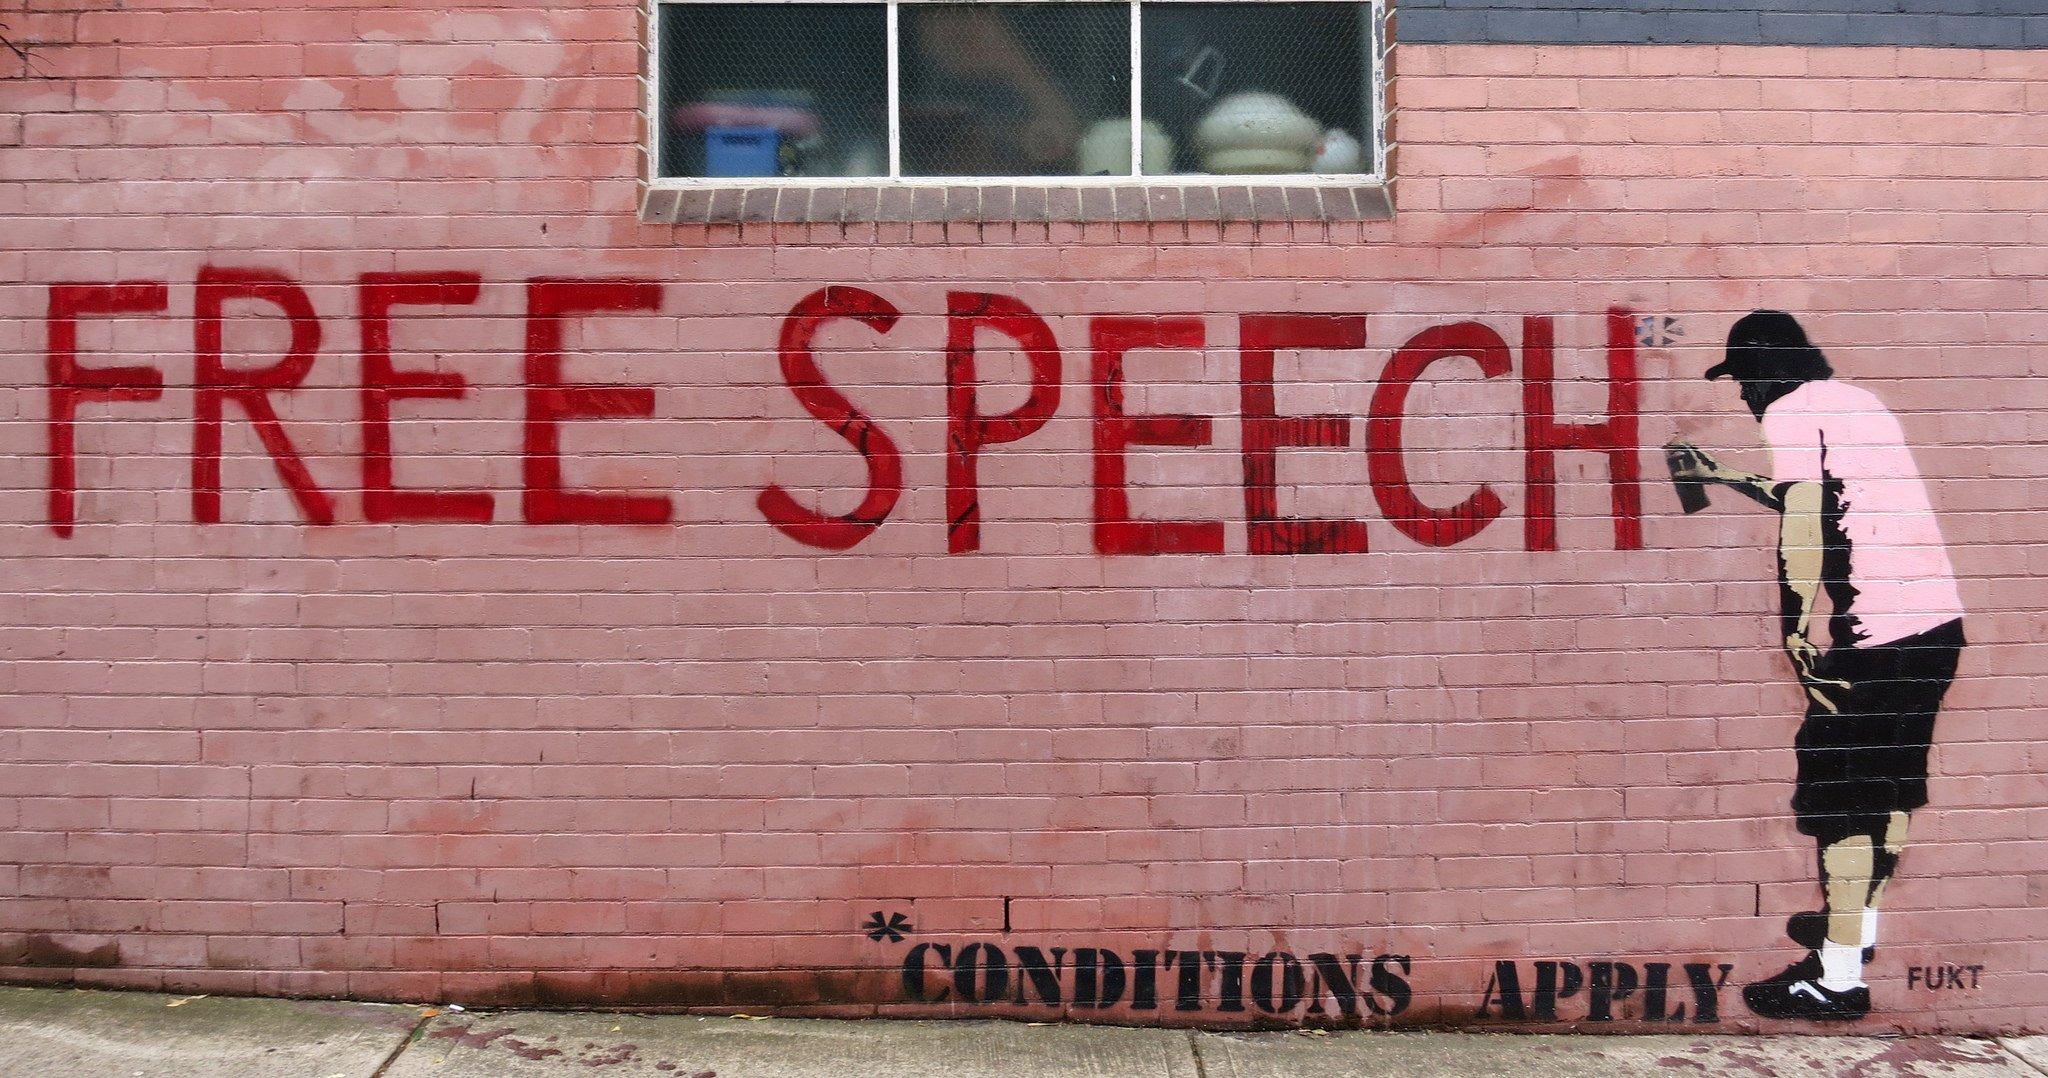 Florida Bringing Back True Freedom of Speech Bans Liberal Free Speech Zones